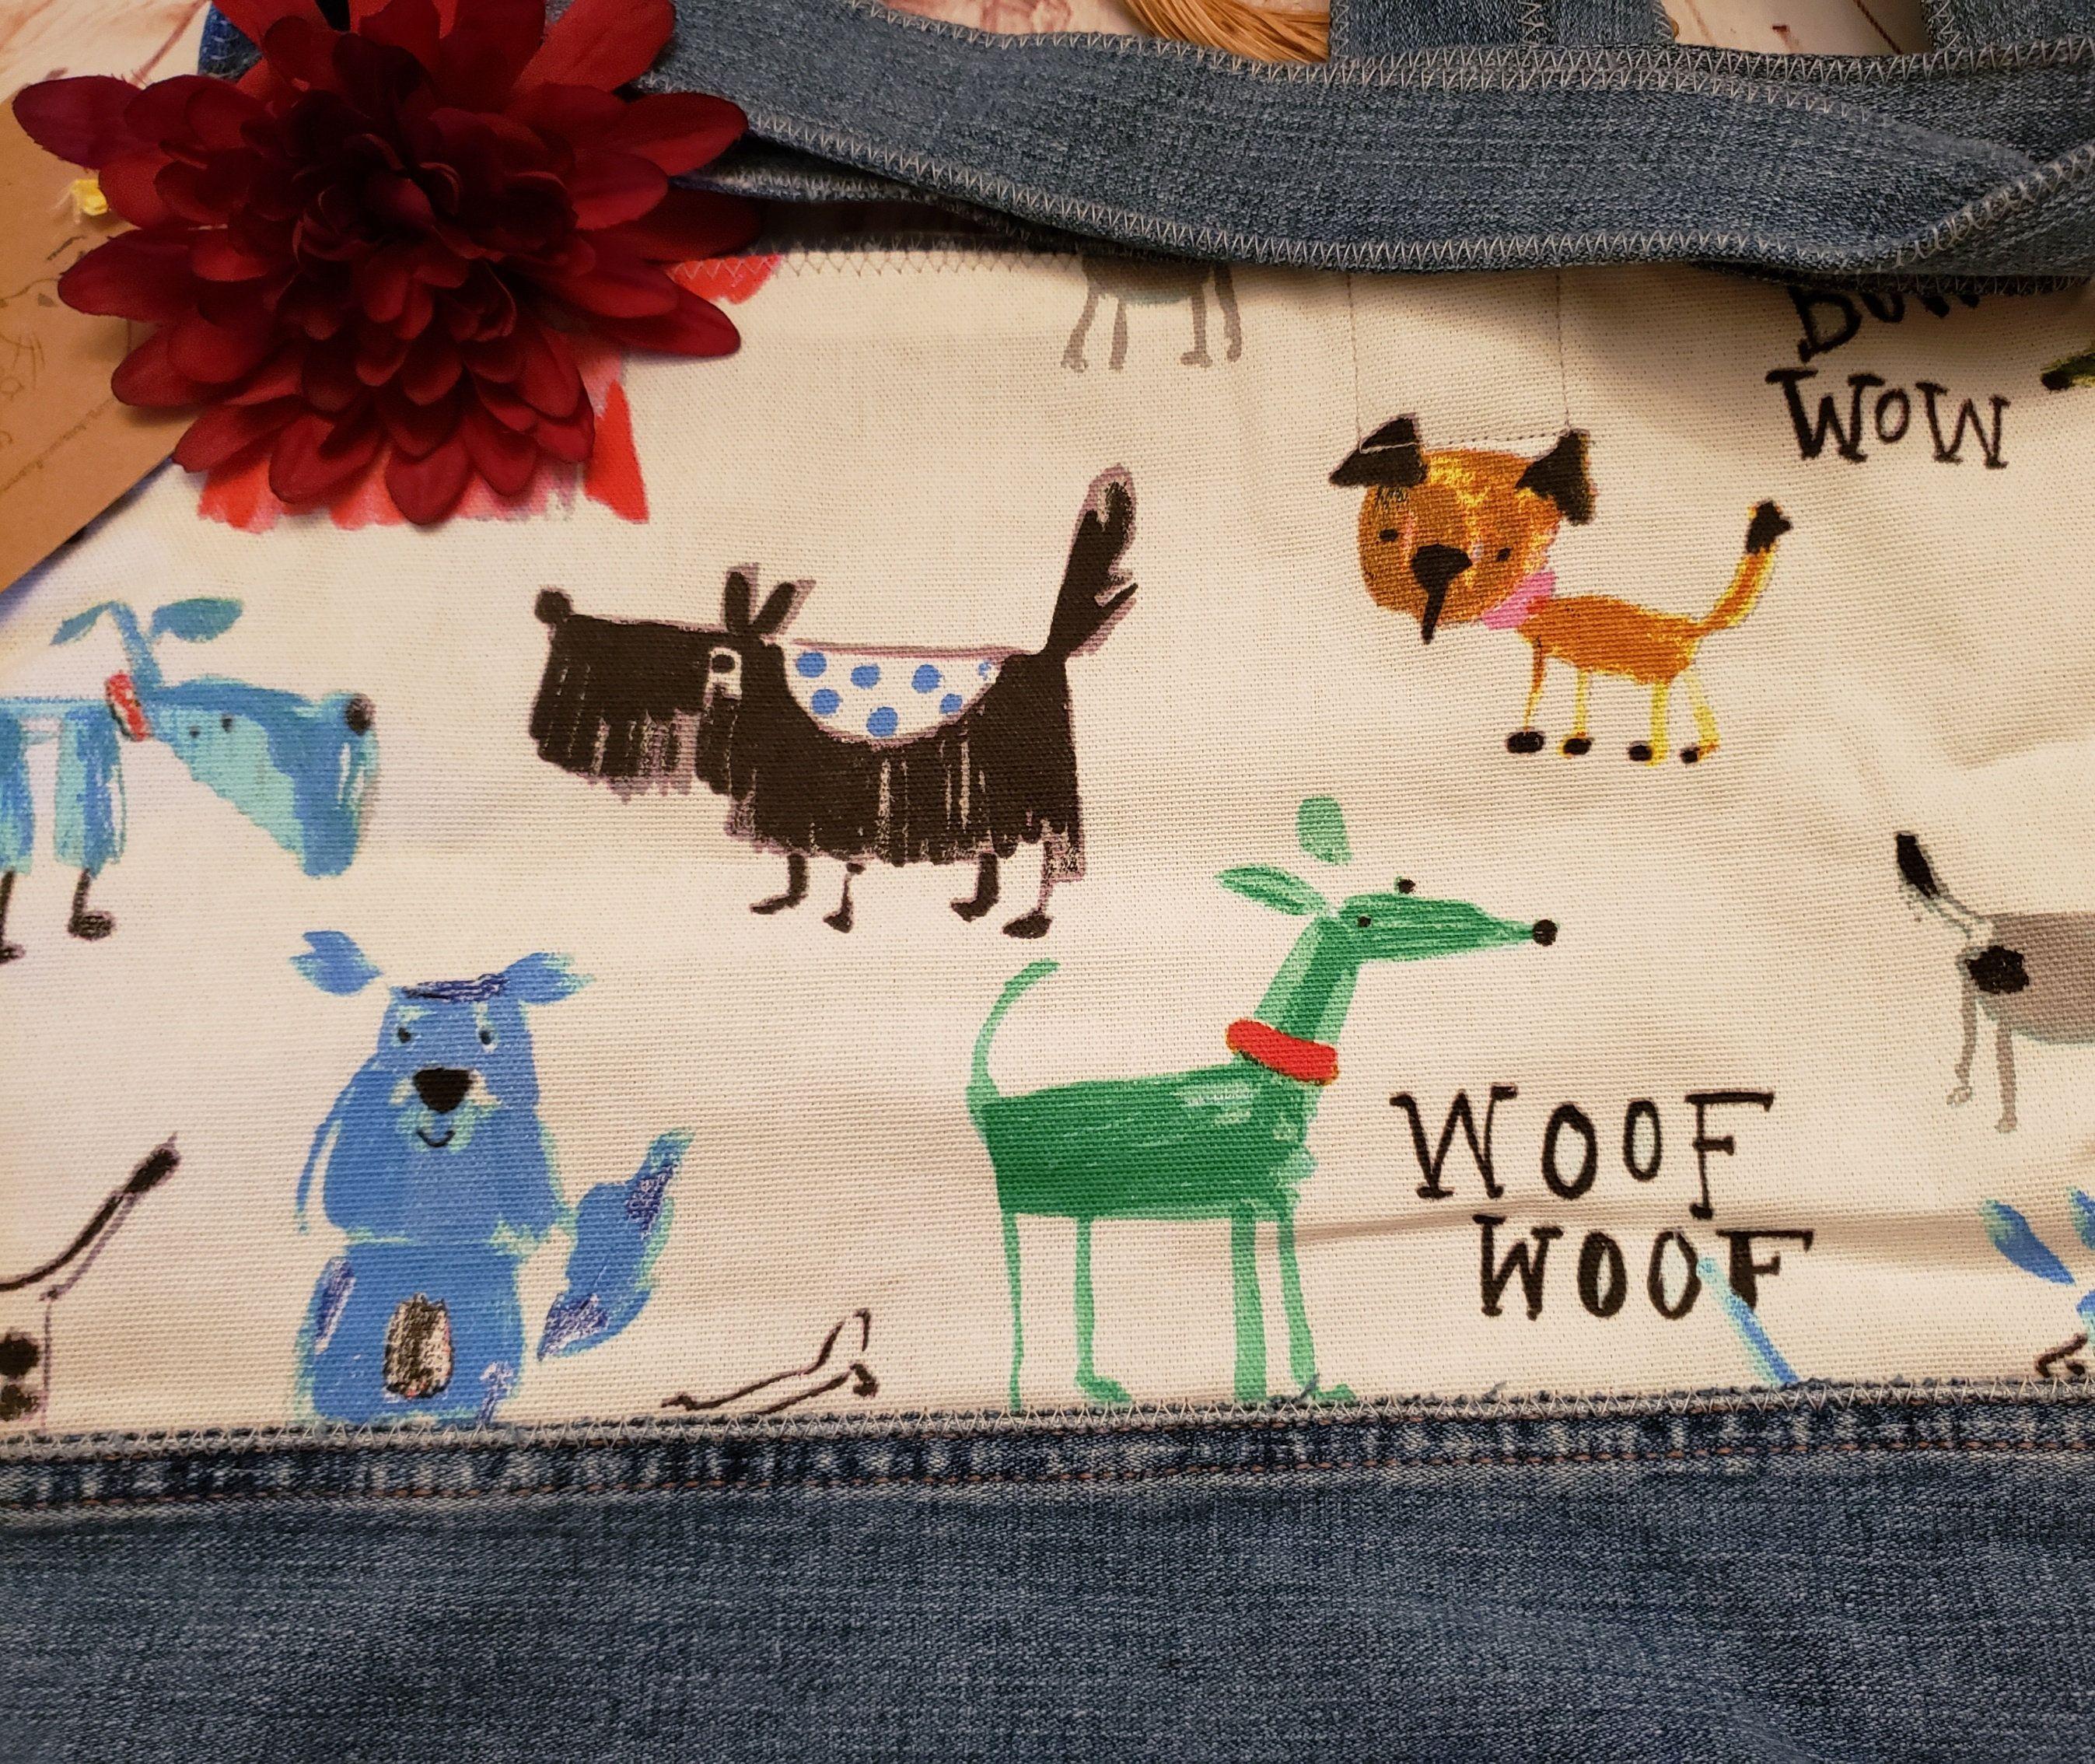 Denim Dog Lovers Tote, Beach Bag, Vacation Bag, Diaper Bag, College Book Bag, Weekender Bag, Denim Tote, Canvas Bag, Dog Lovers, USA Made